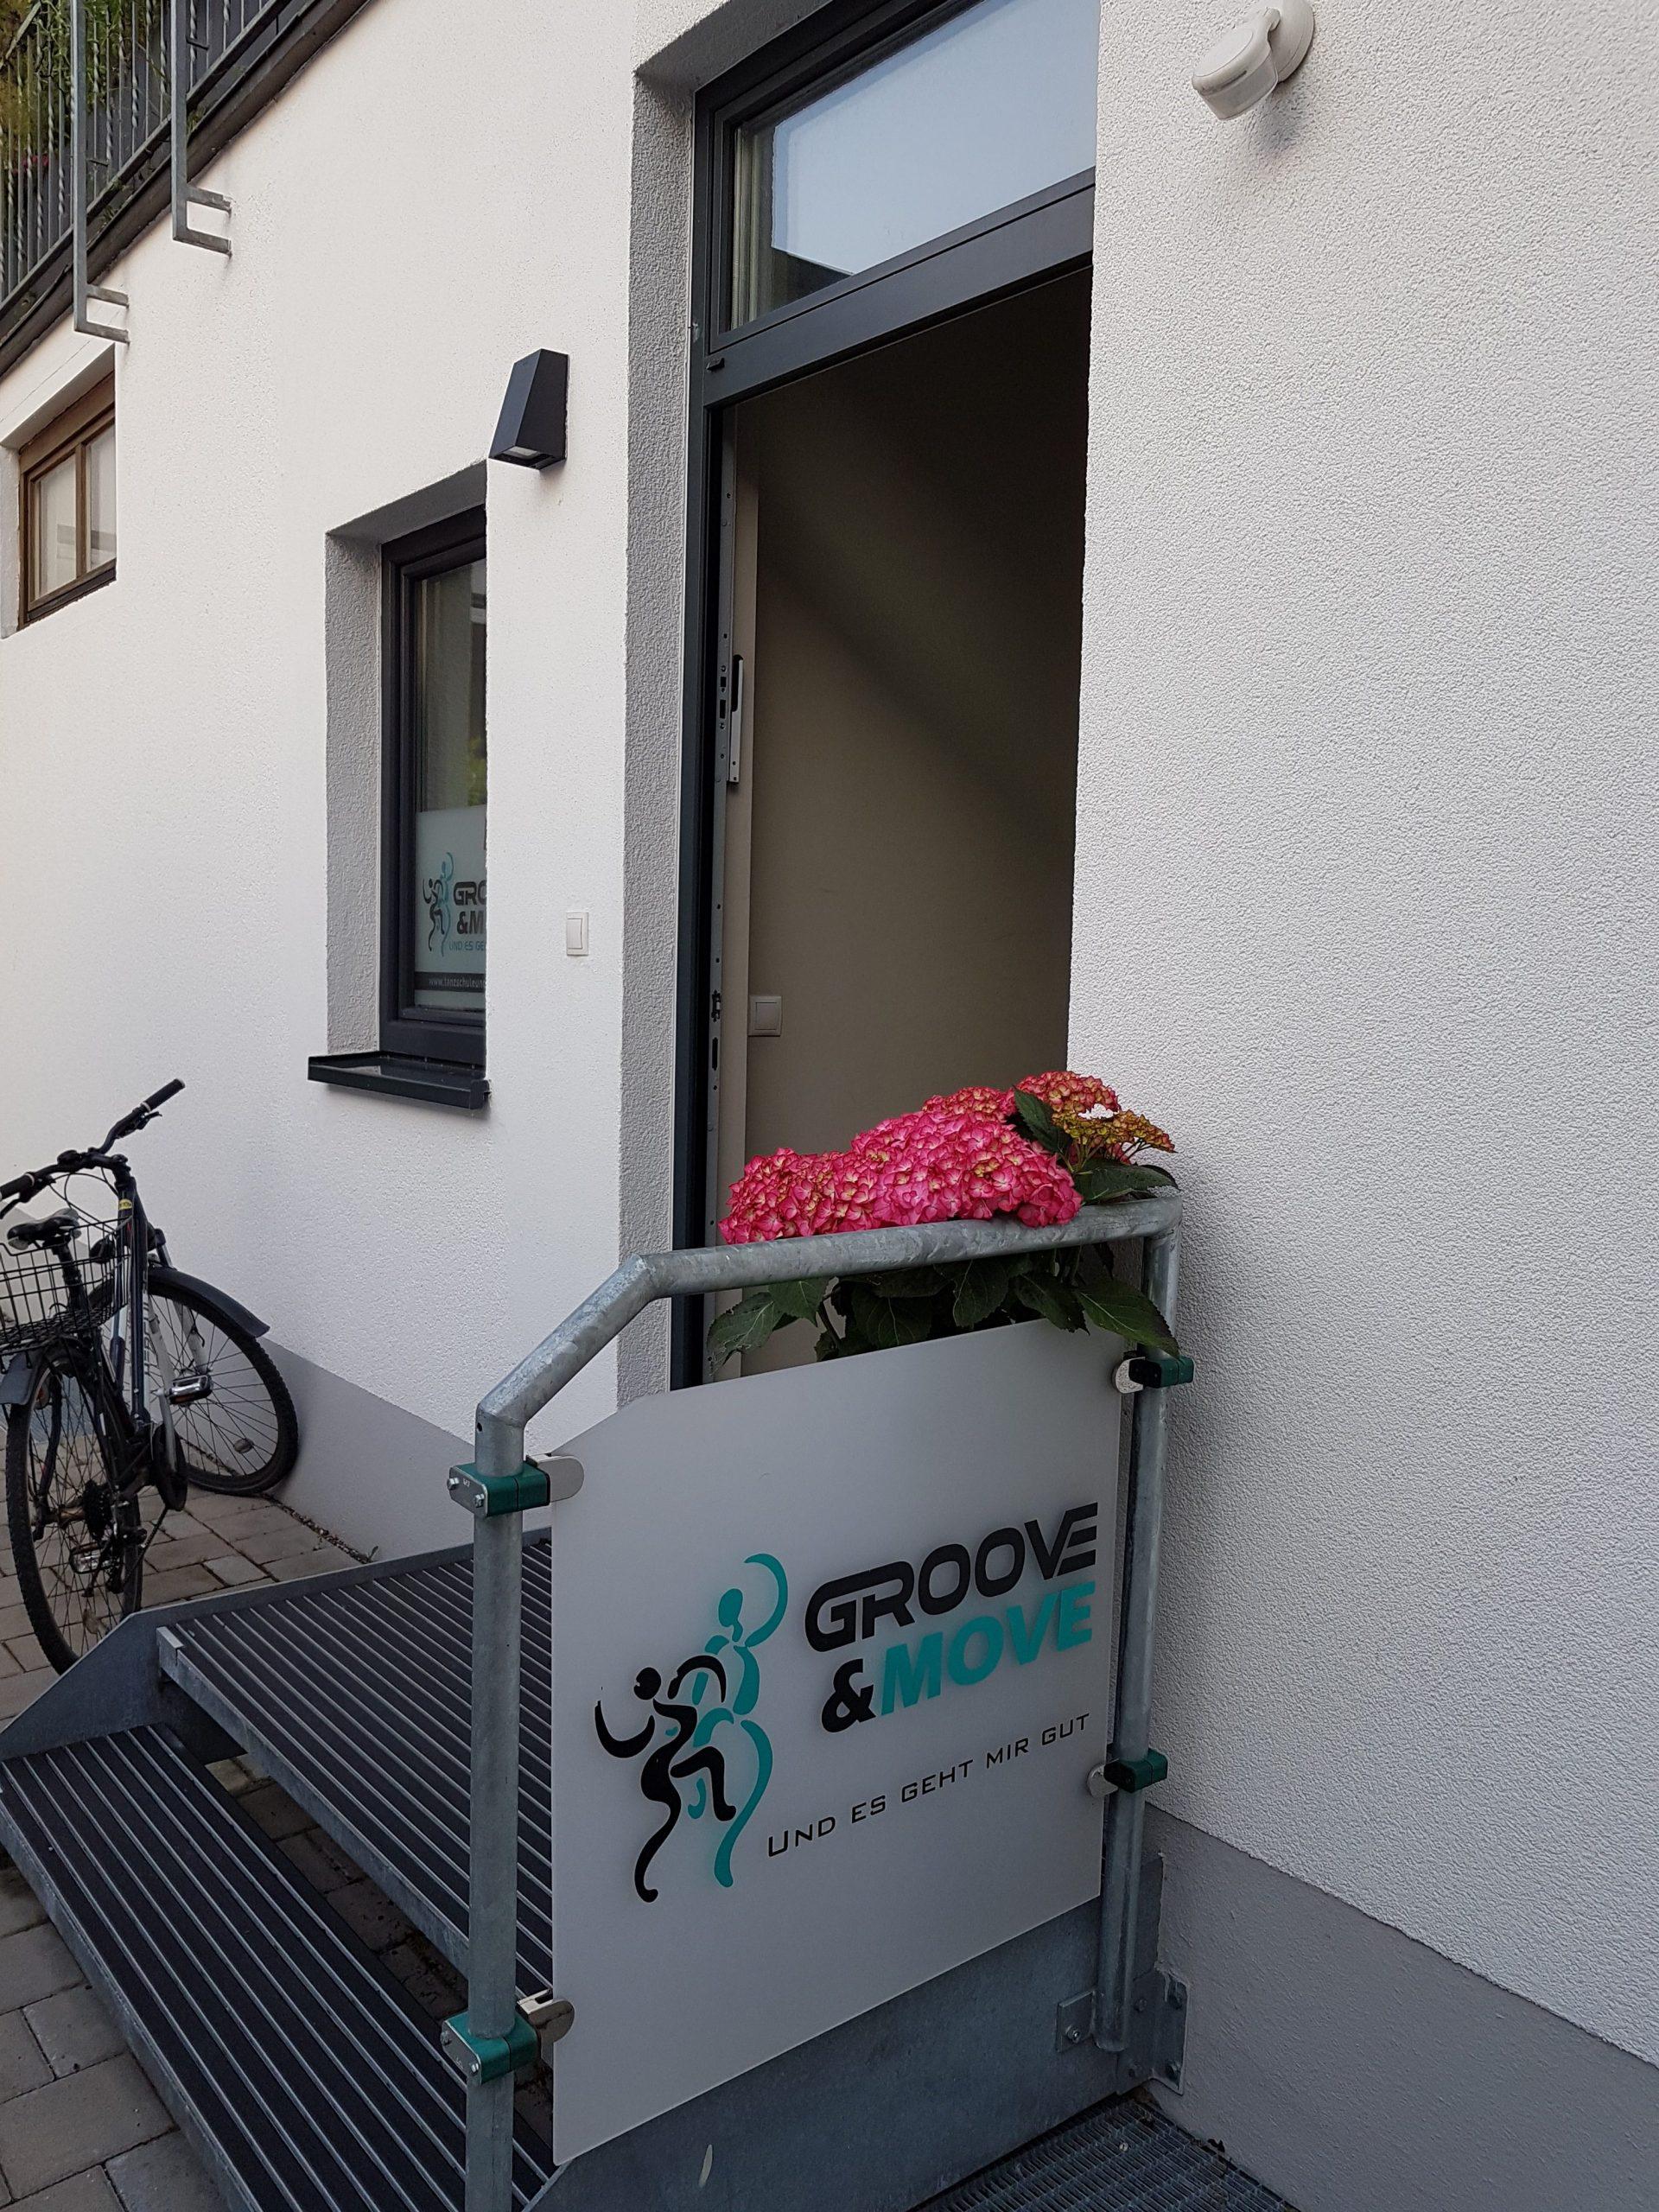 Adelsdorf_Groove & Move